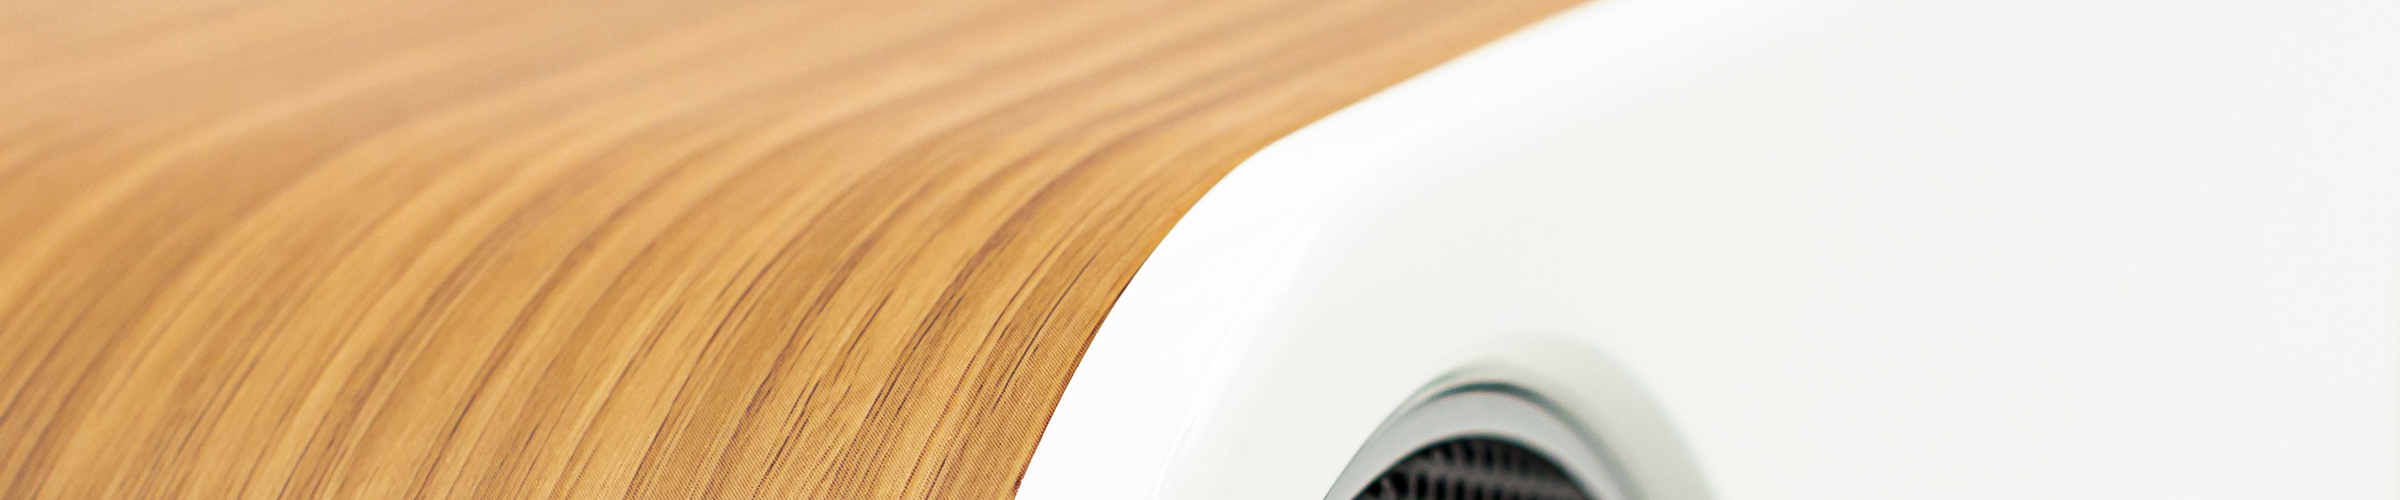 Fi30 bluetooth speaker cabinet wood design